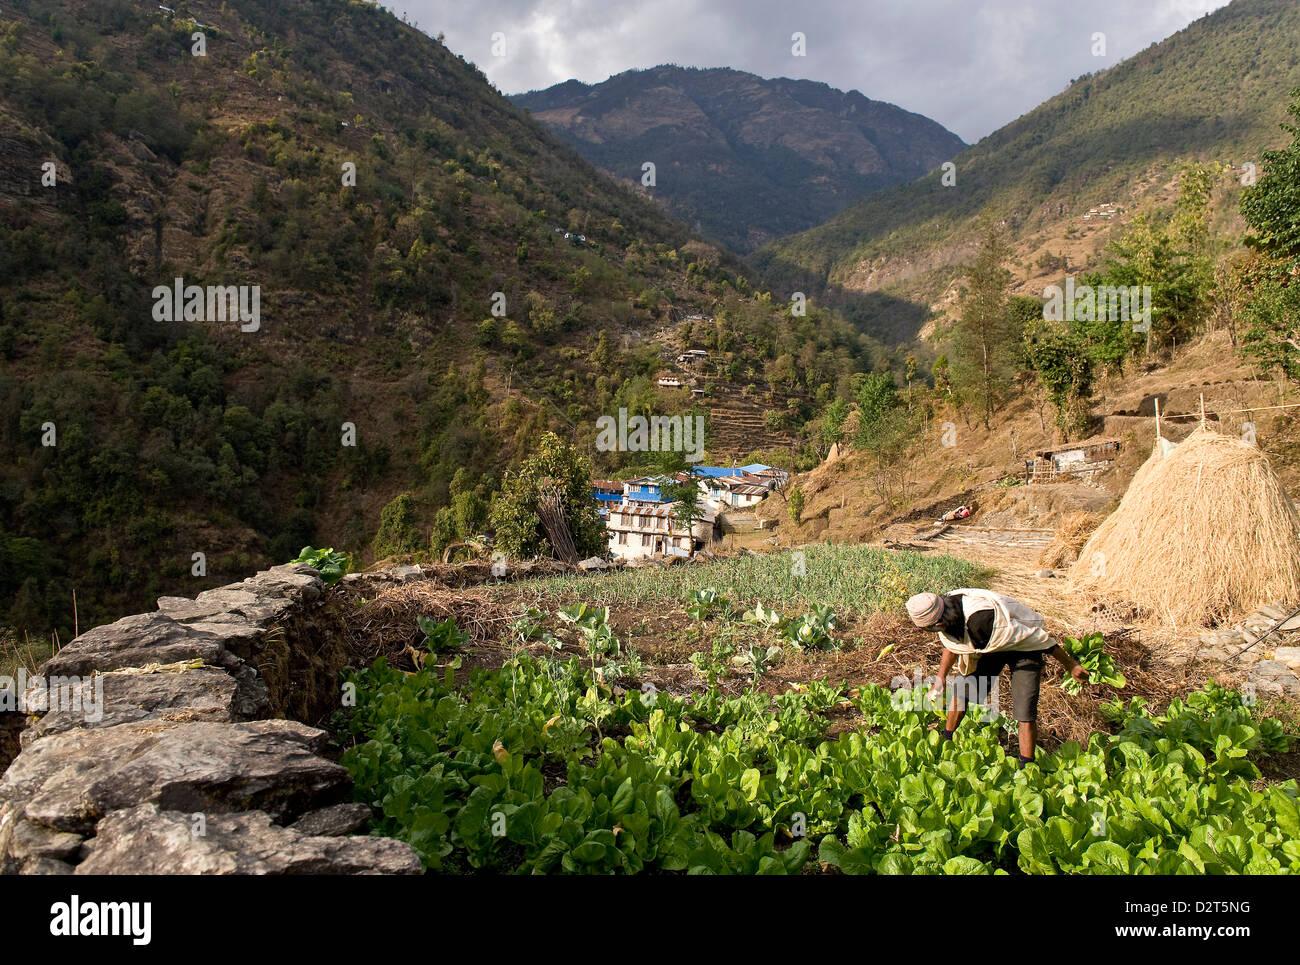 Tikhedhunga Village, Annapurna Himal, Nepal, Himalayas, Asia - Stock Image